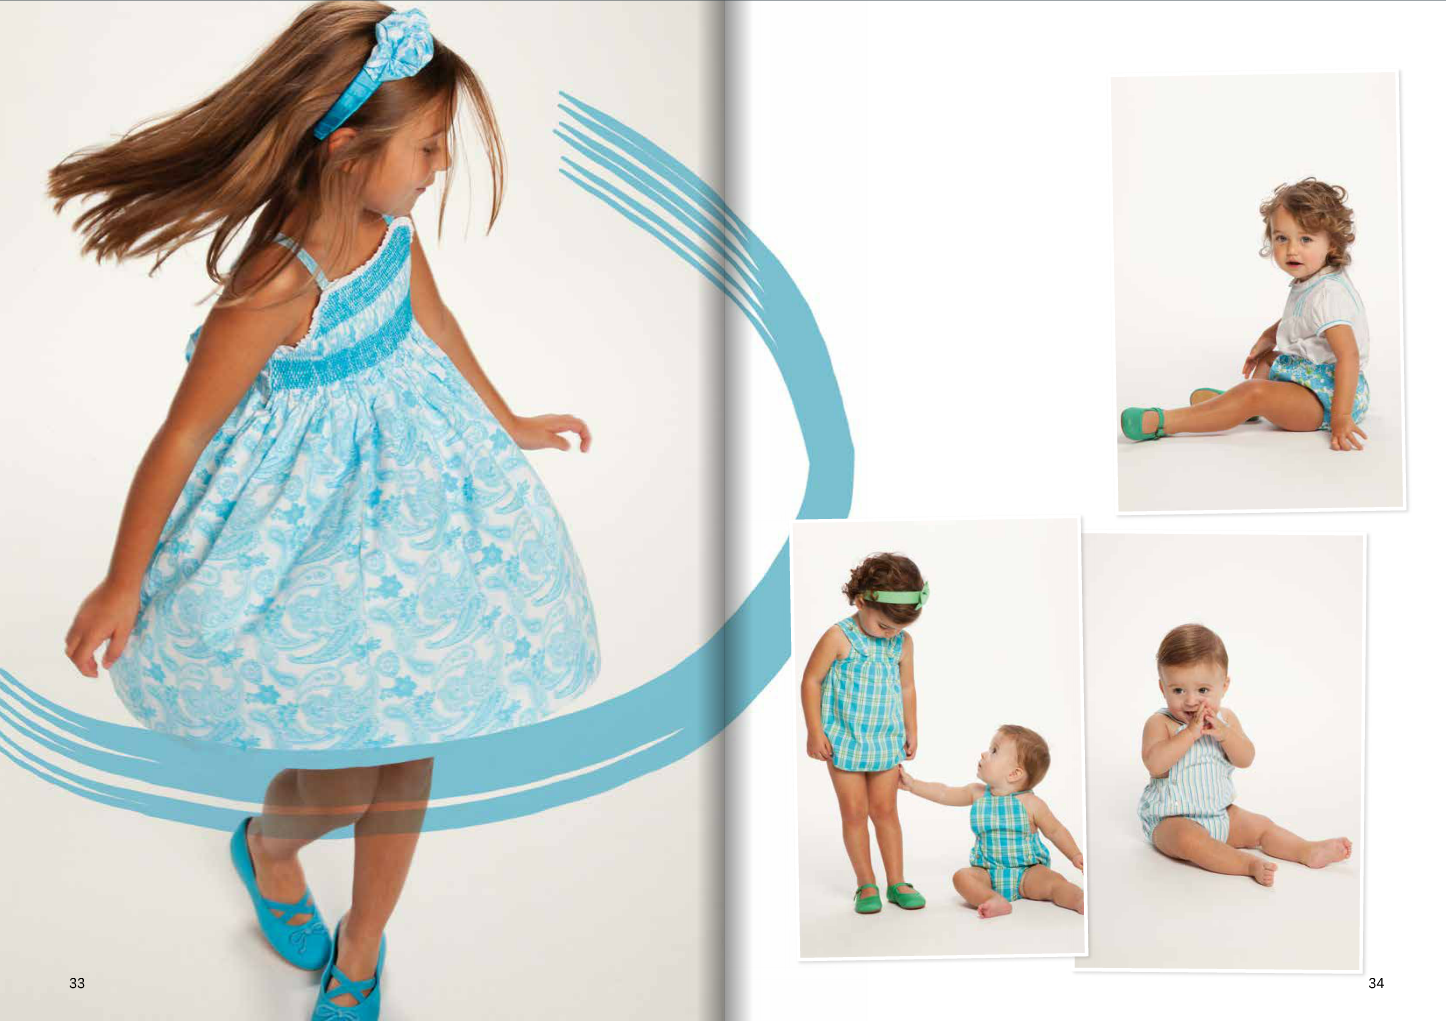 Zapatos de moda en macys newhairstylesformen2014 com